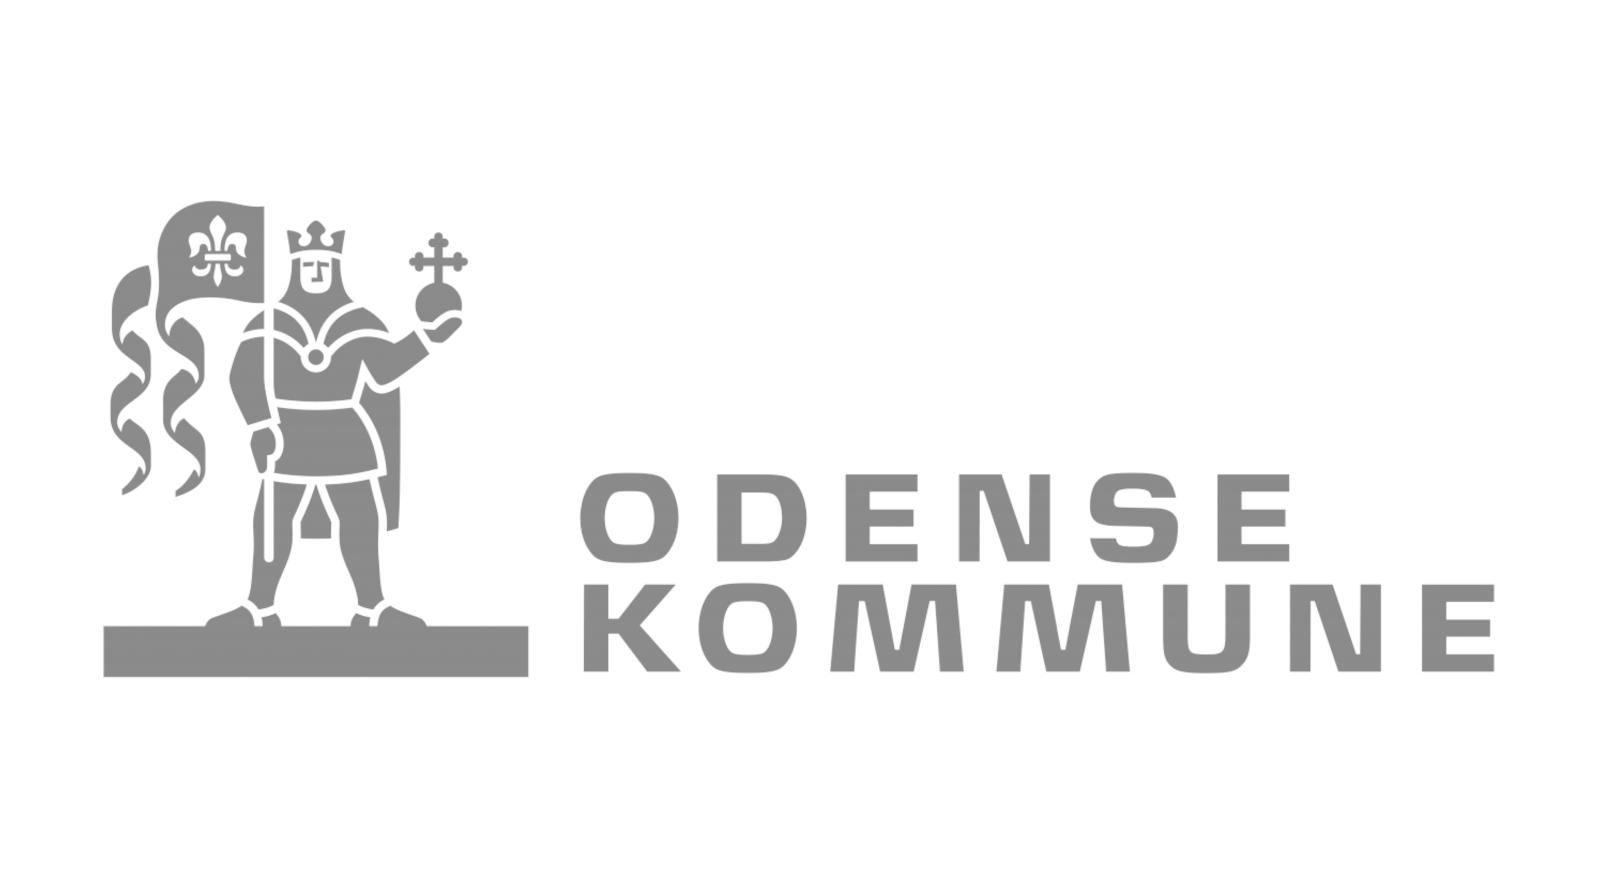 odense-kommune-grayscaled